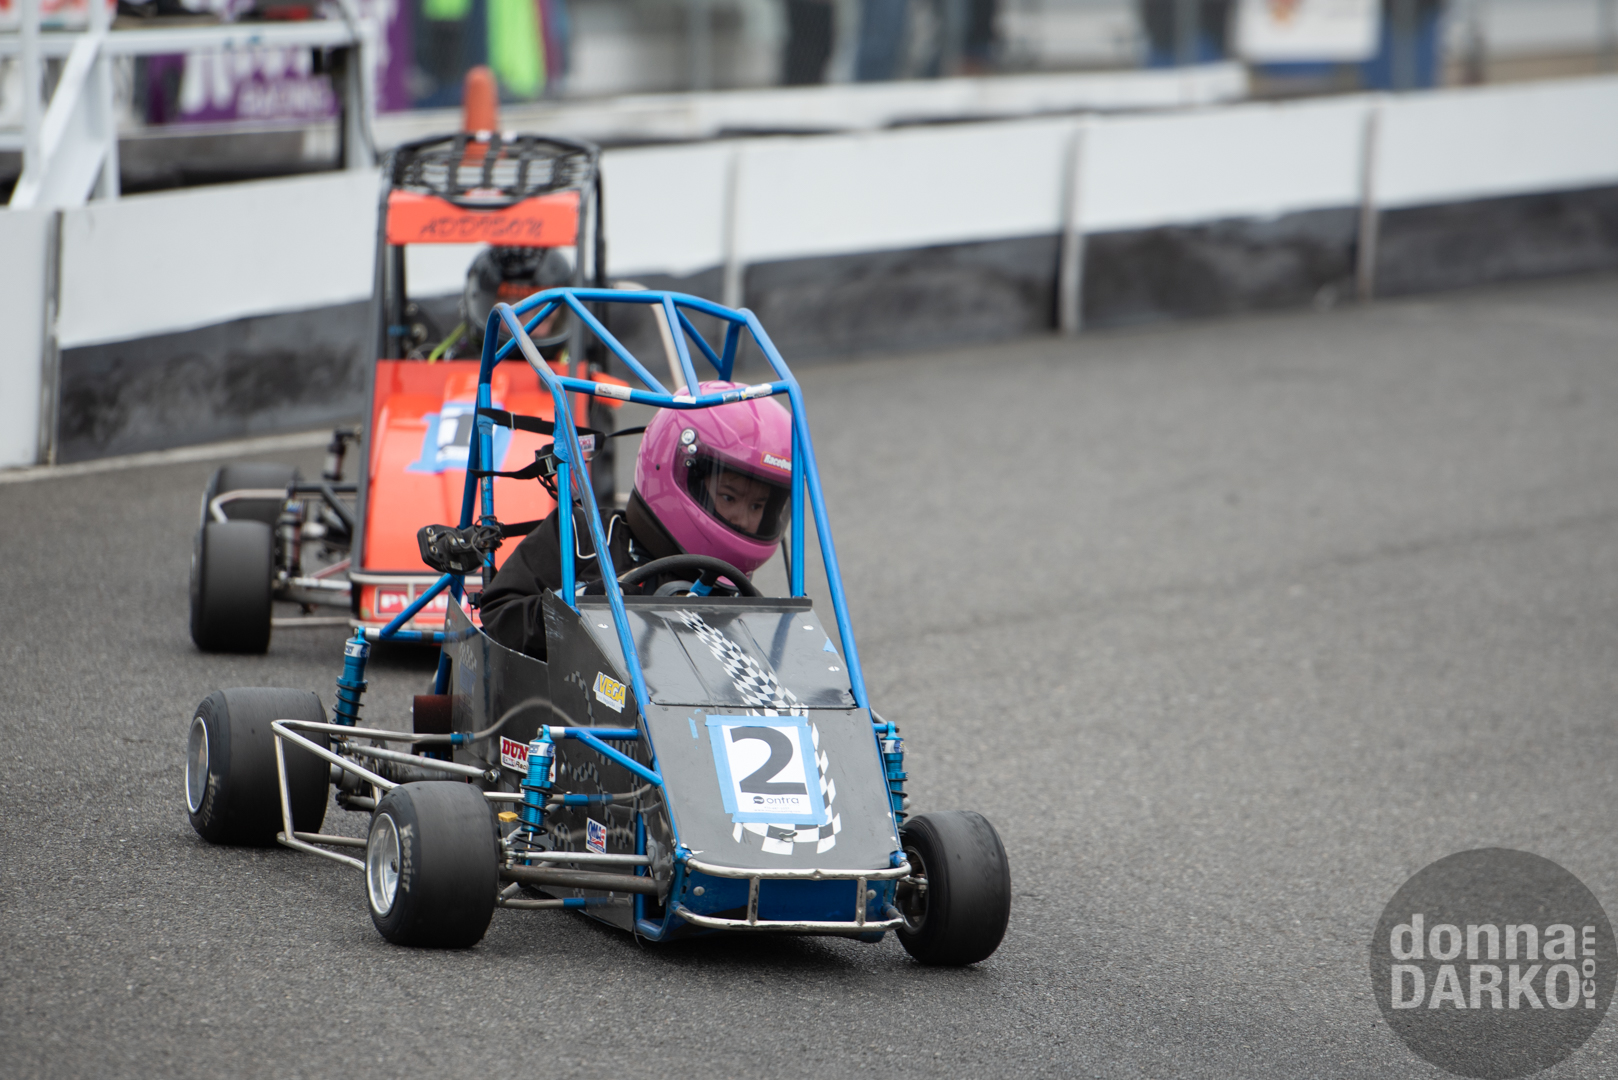 QWMA (Racing) 8-11-2019 DSC_6124.jpg